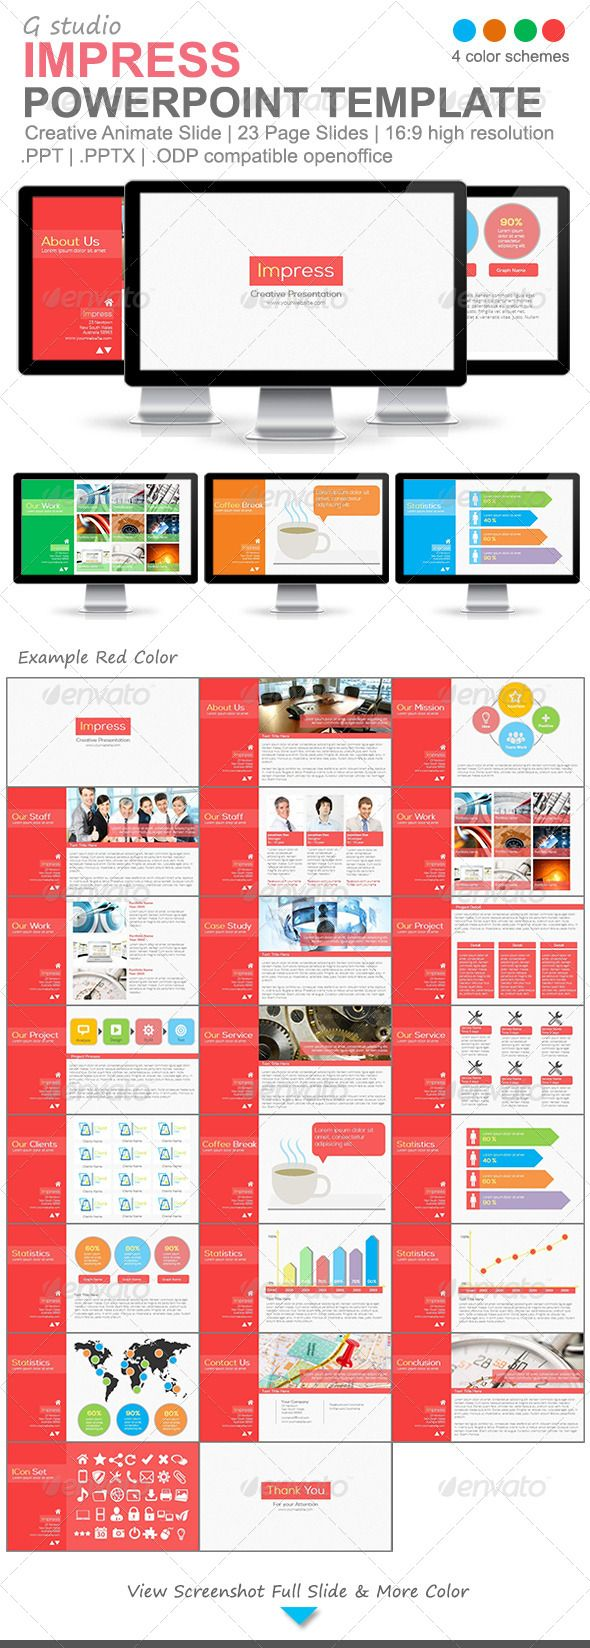 Gstudio Impress Powerpoint Template - Powerpoint Templates Presentation Templates